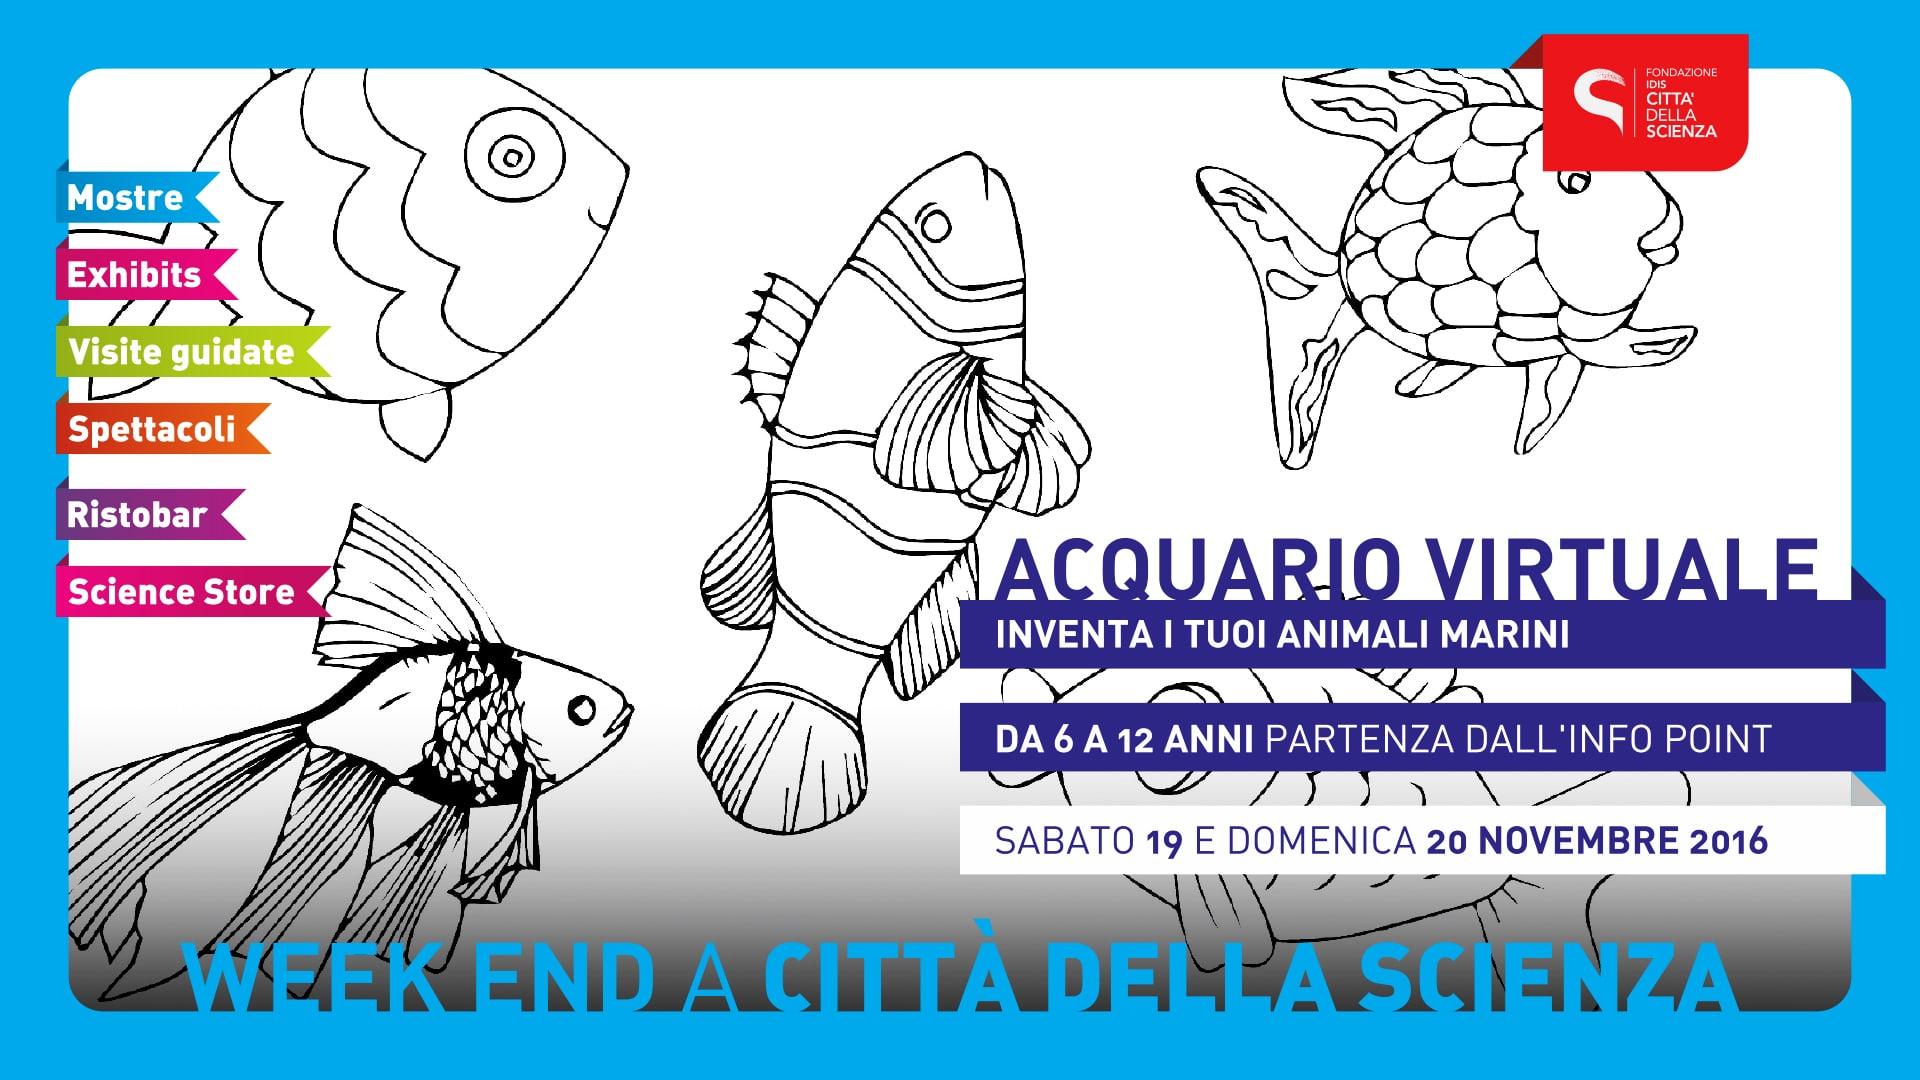 ACQUARIO_VIRTUALE_1920_x_1080-min